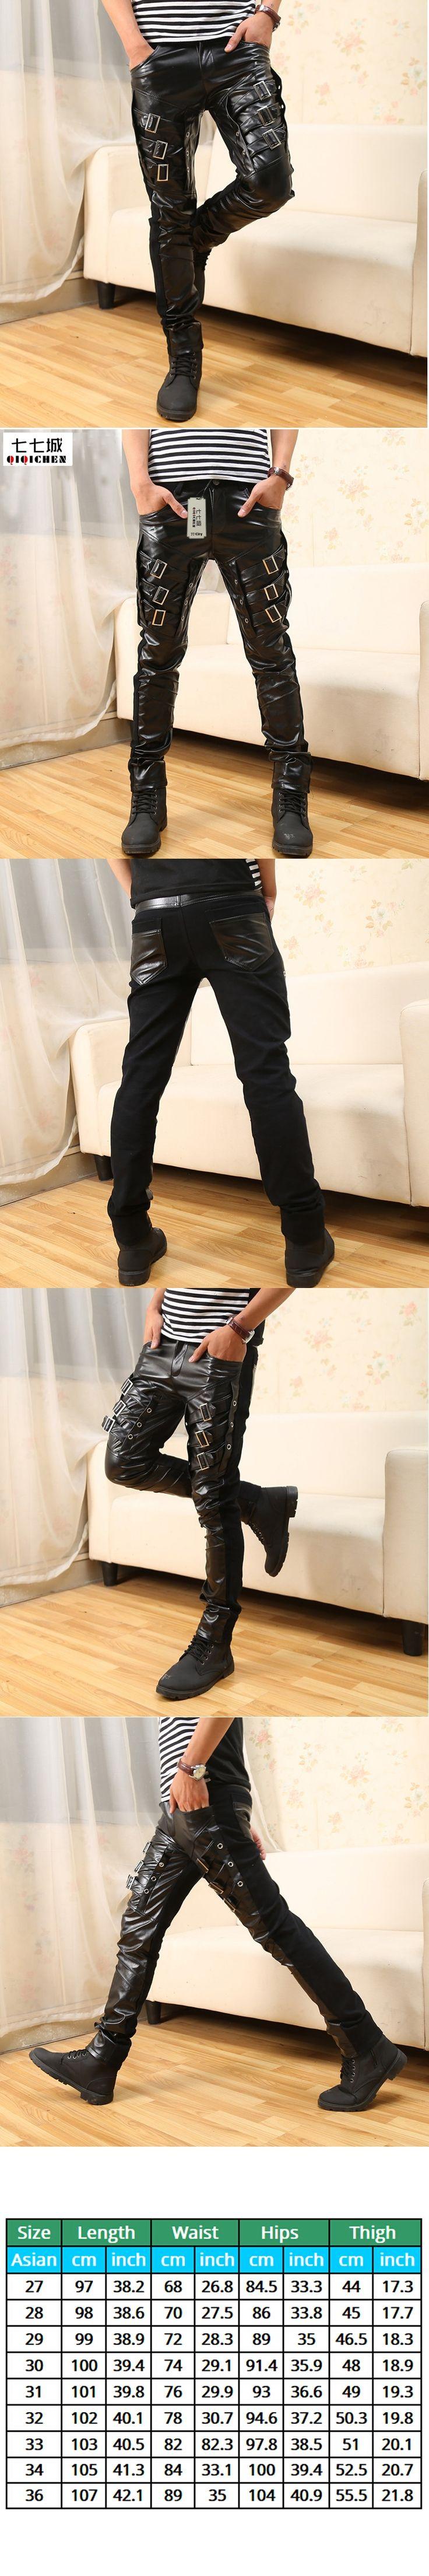 Man Leather Pants New Arrival Mens Korean Gothic Punk Fashion Faux Leather Pants PU Buckles Hip Hop Black Leather Trousers Male